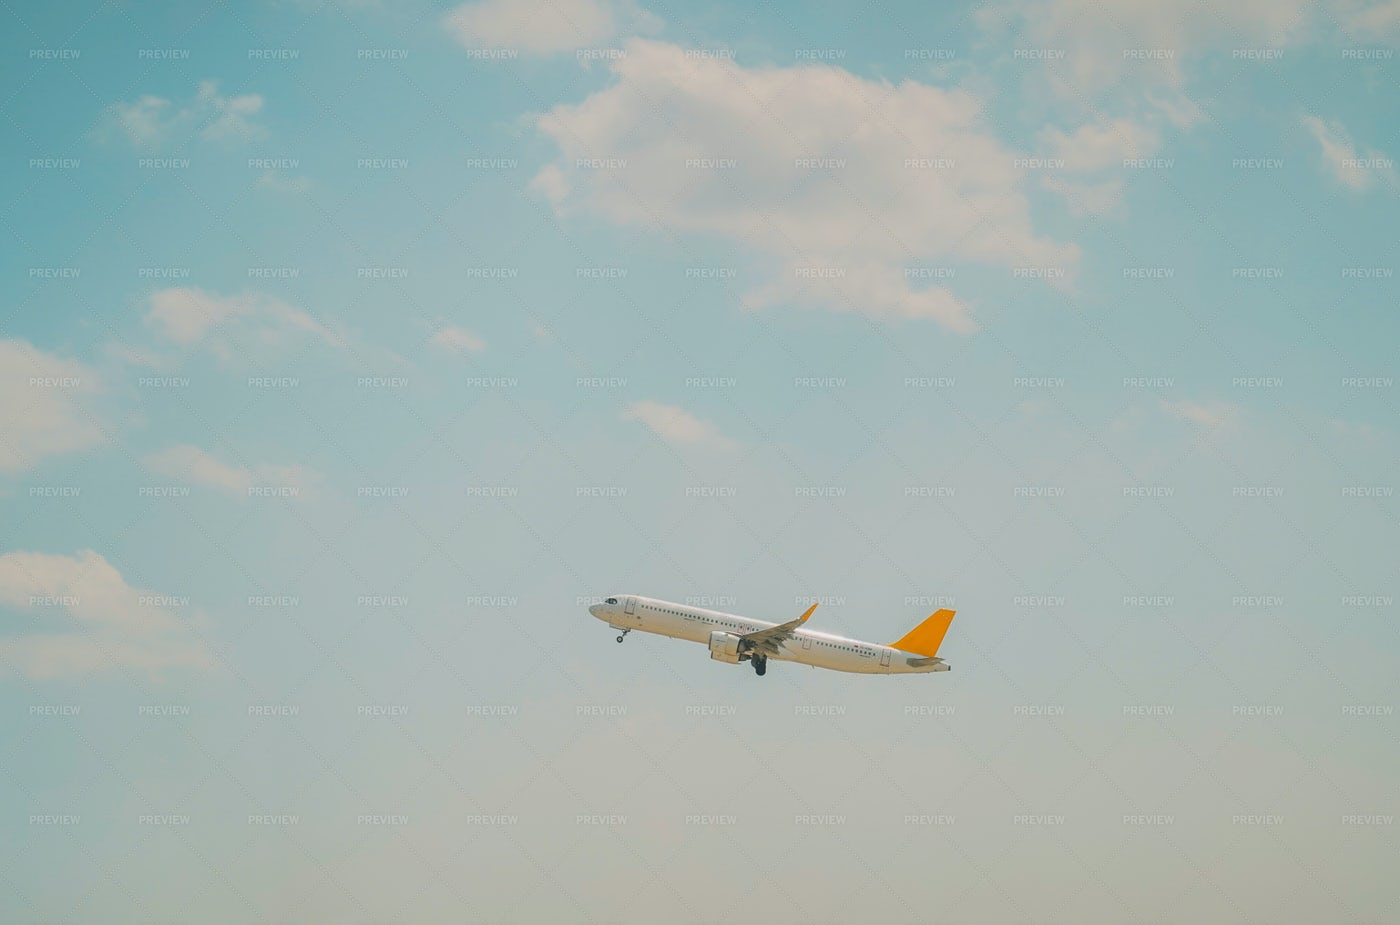 Plane In The Sky: Stock Photos